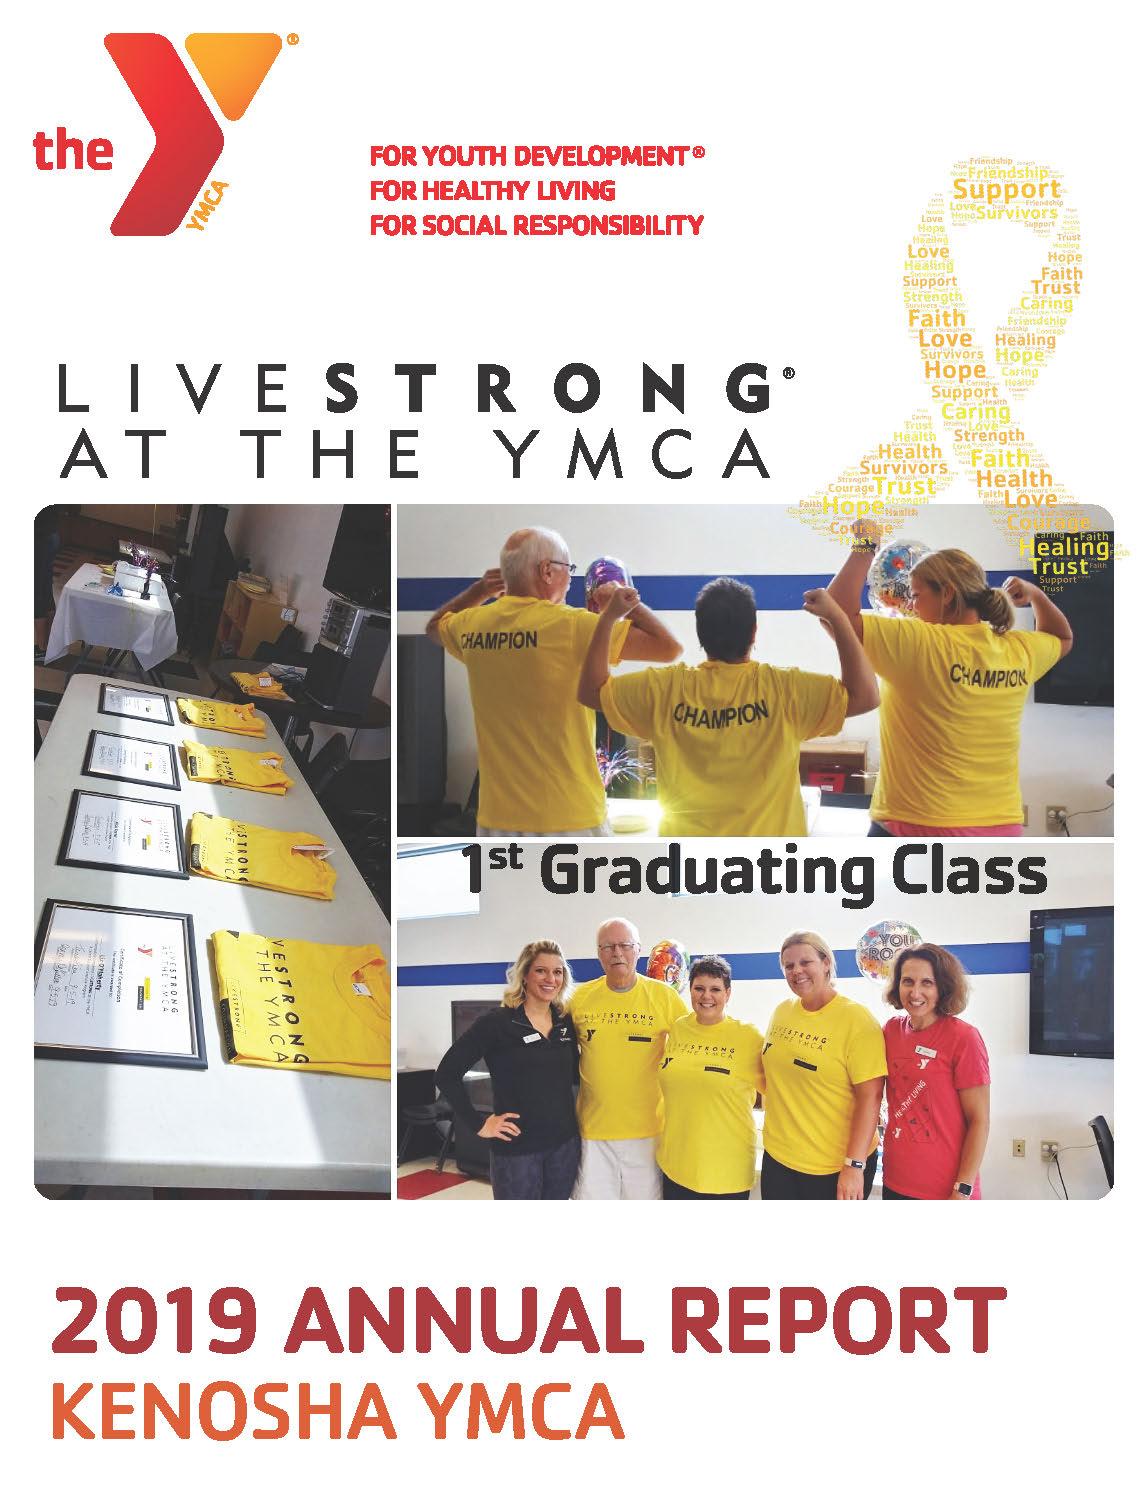 Kenosha YMCA 2019 Annual Report